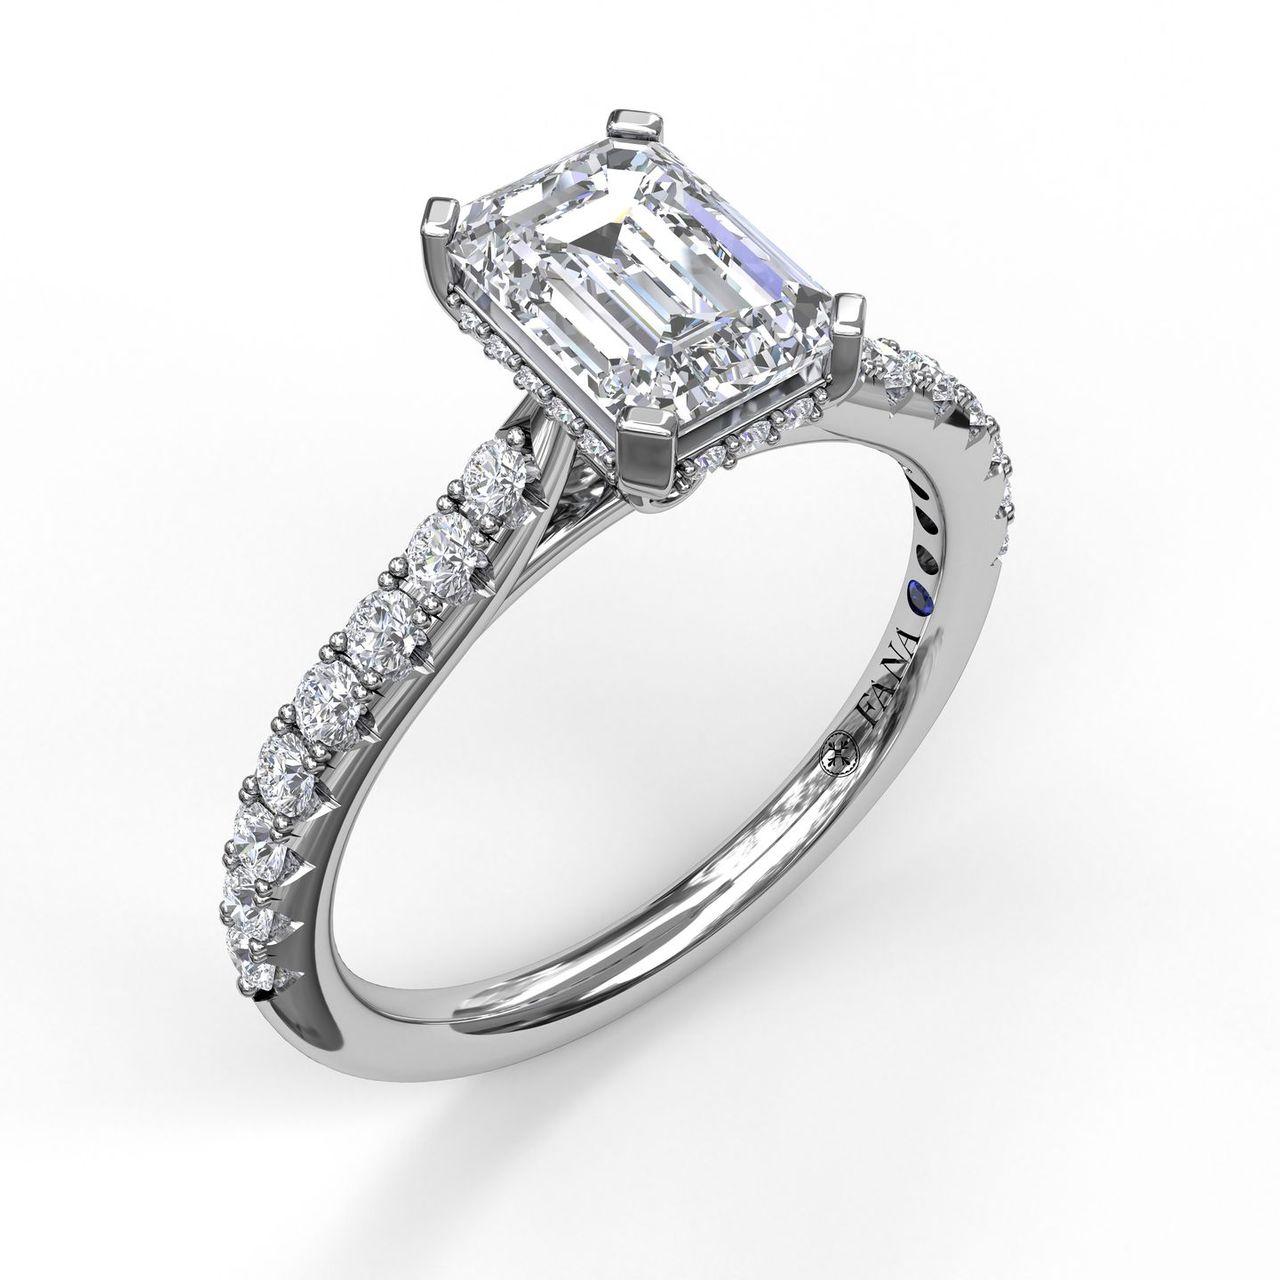 Classic Emerald Cut Engagement Ring with a Subtle Diamond Splash